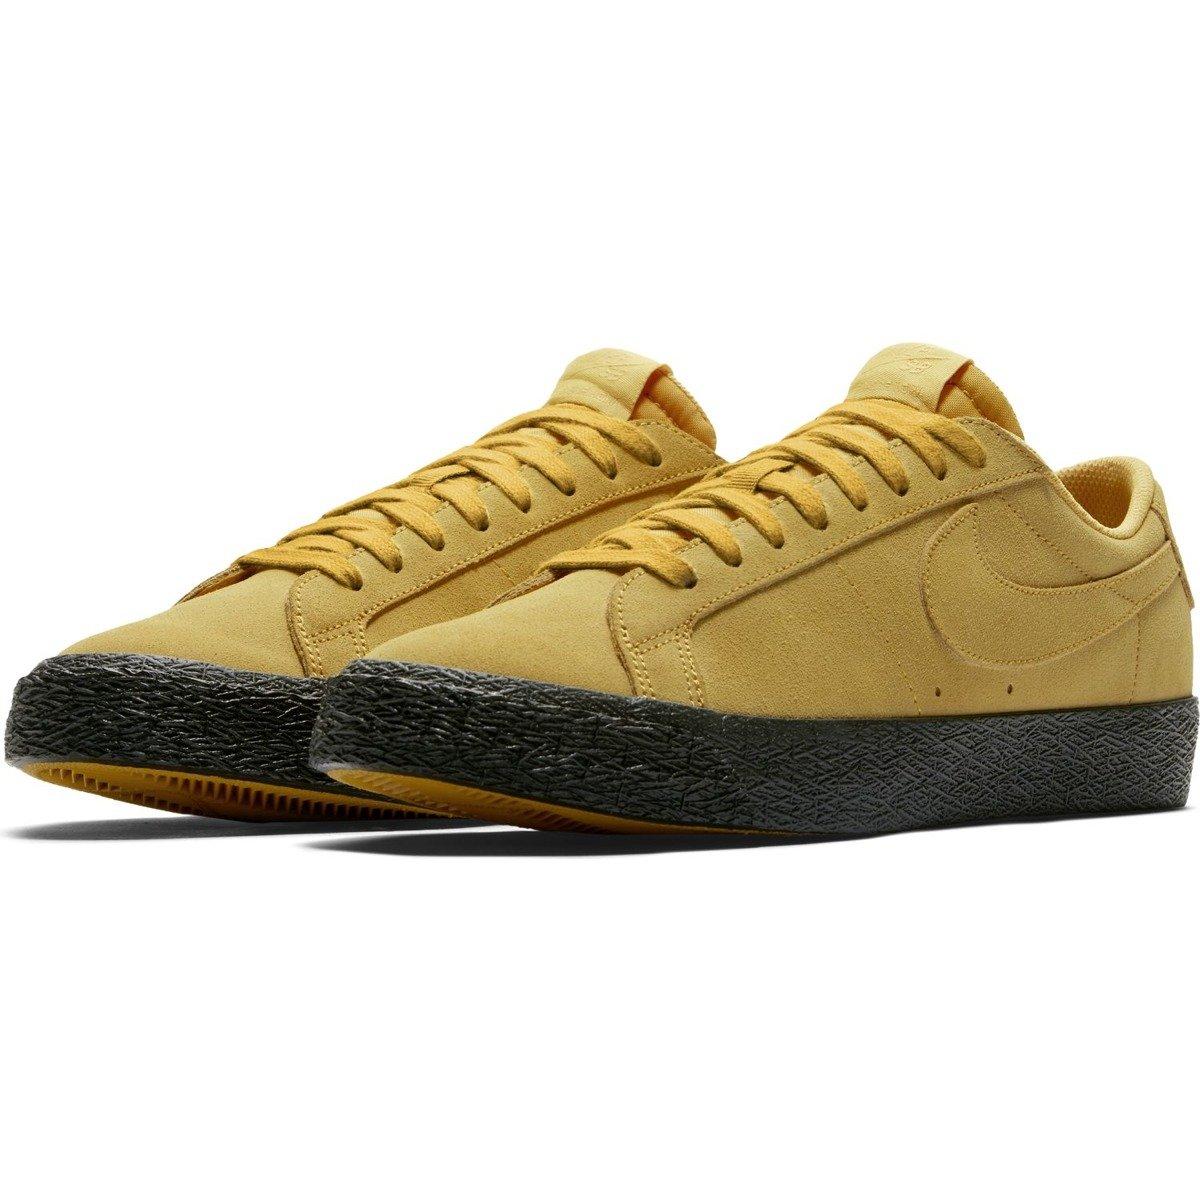 uk availability c795d 14bd8 shoes nike sb zoom blazer low YELLOW OCHRE/YELLOW OCHRE-BLACK